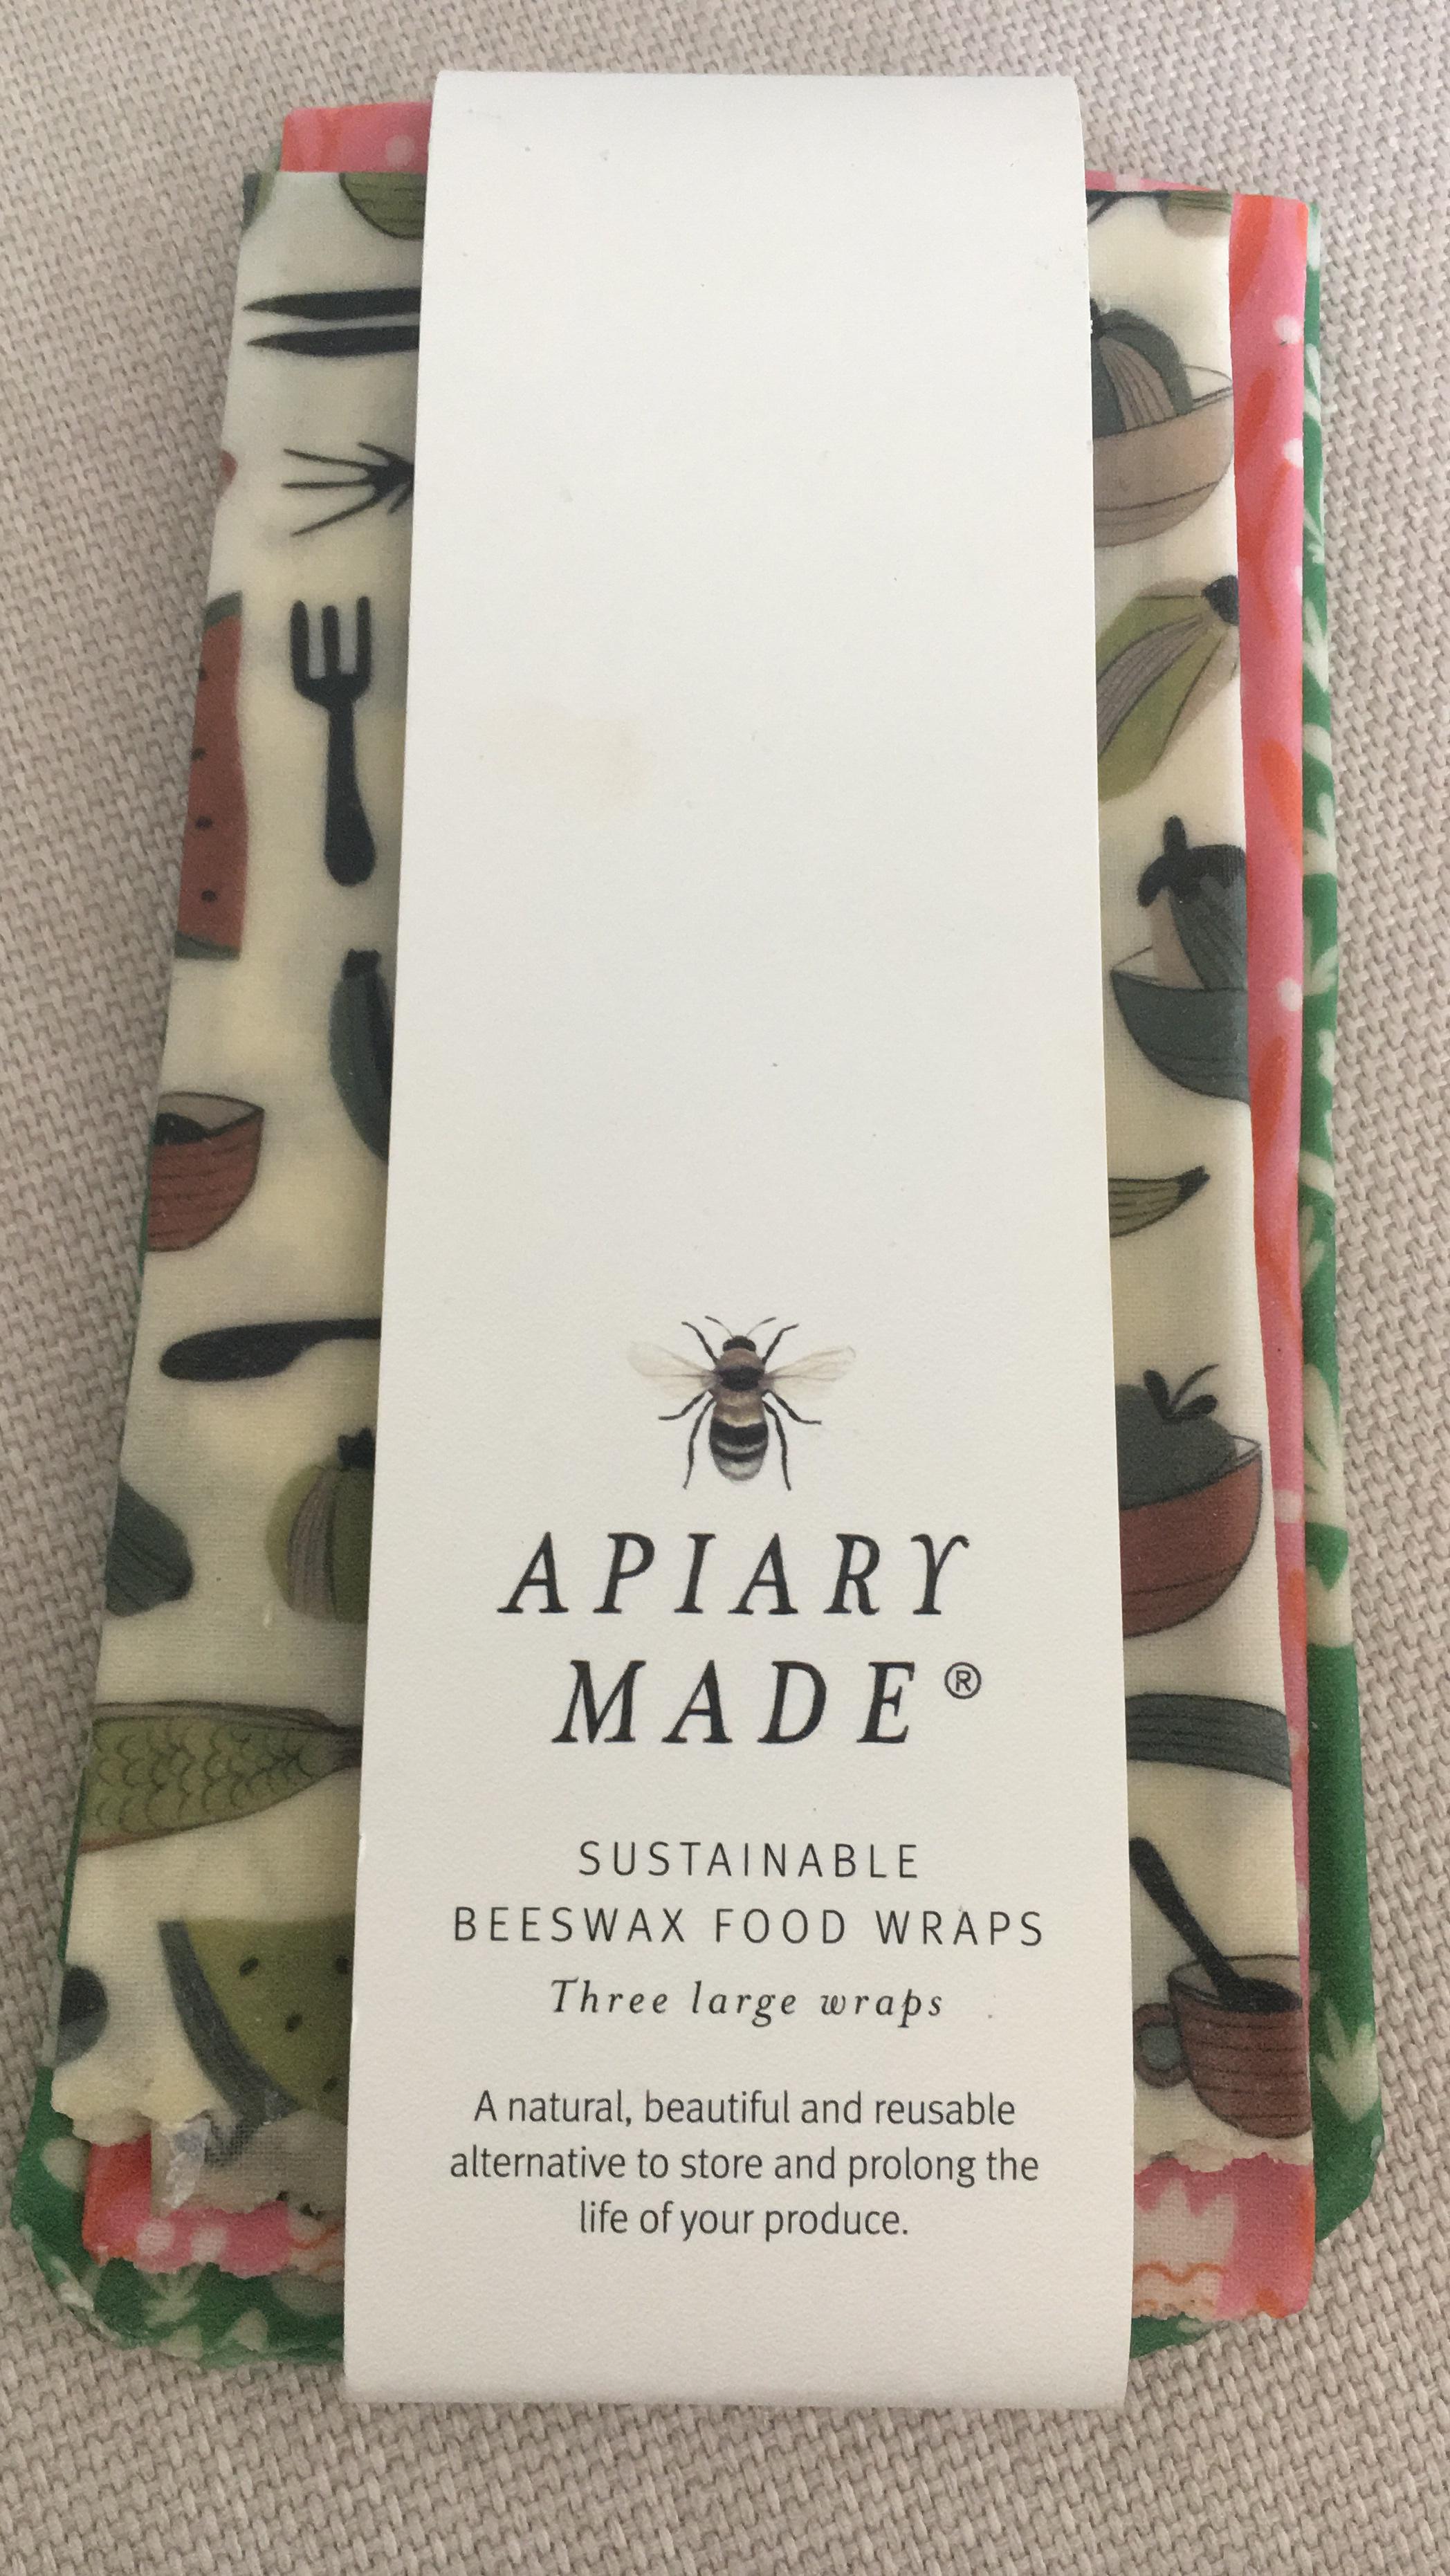 Embalagens da Apiary Made- empresa australiana